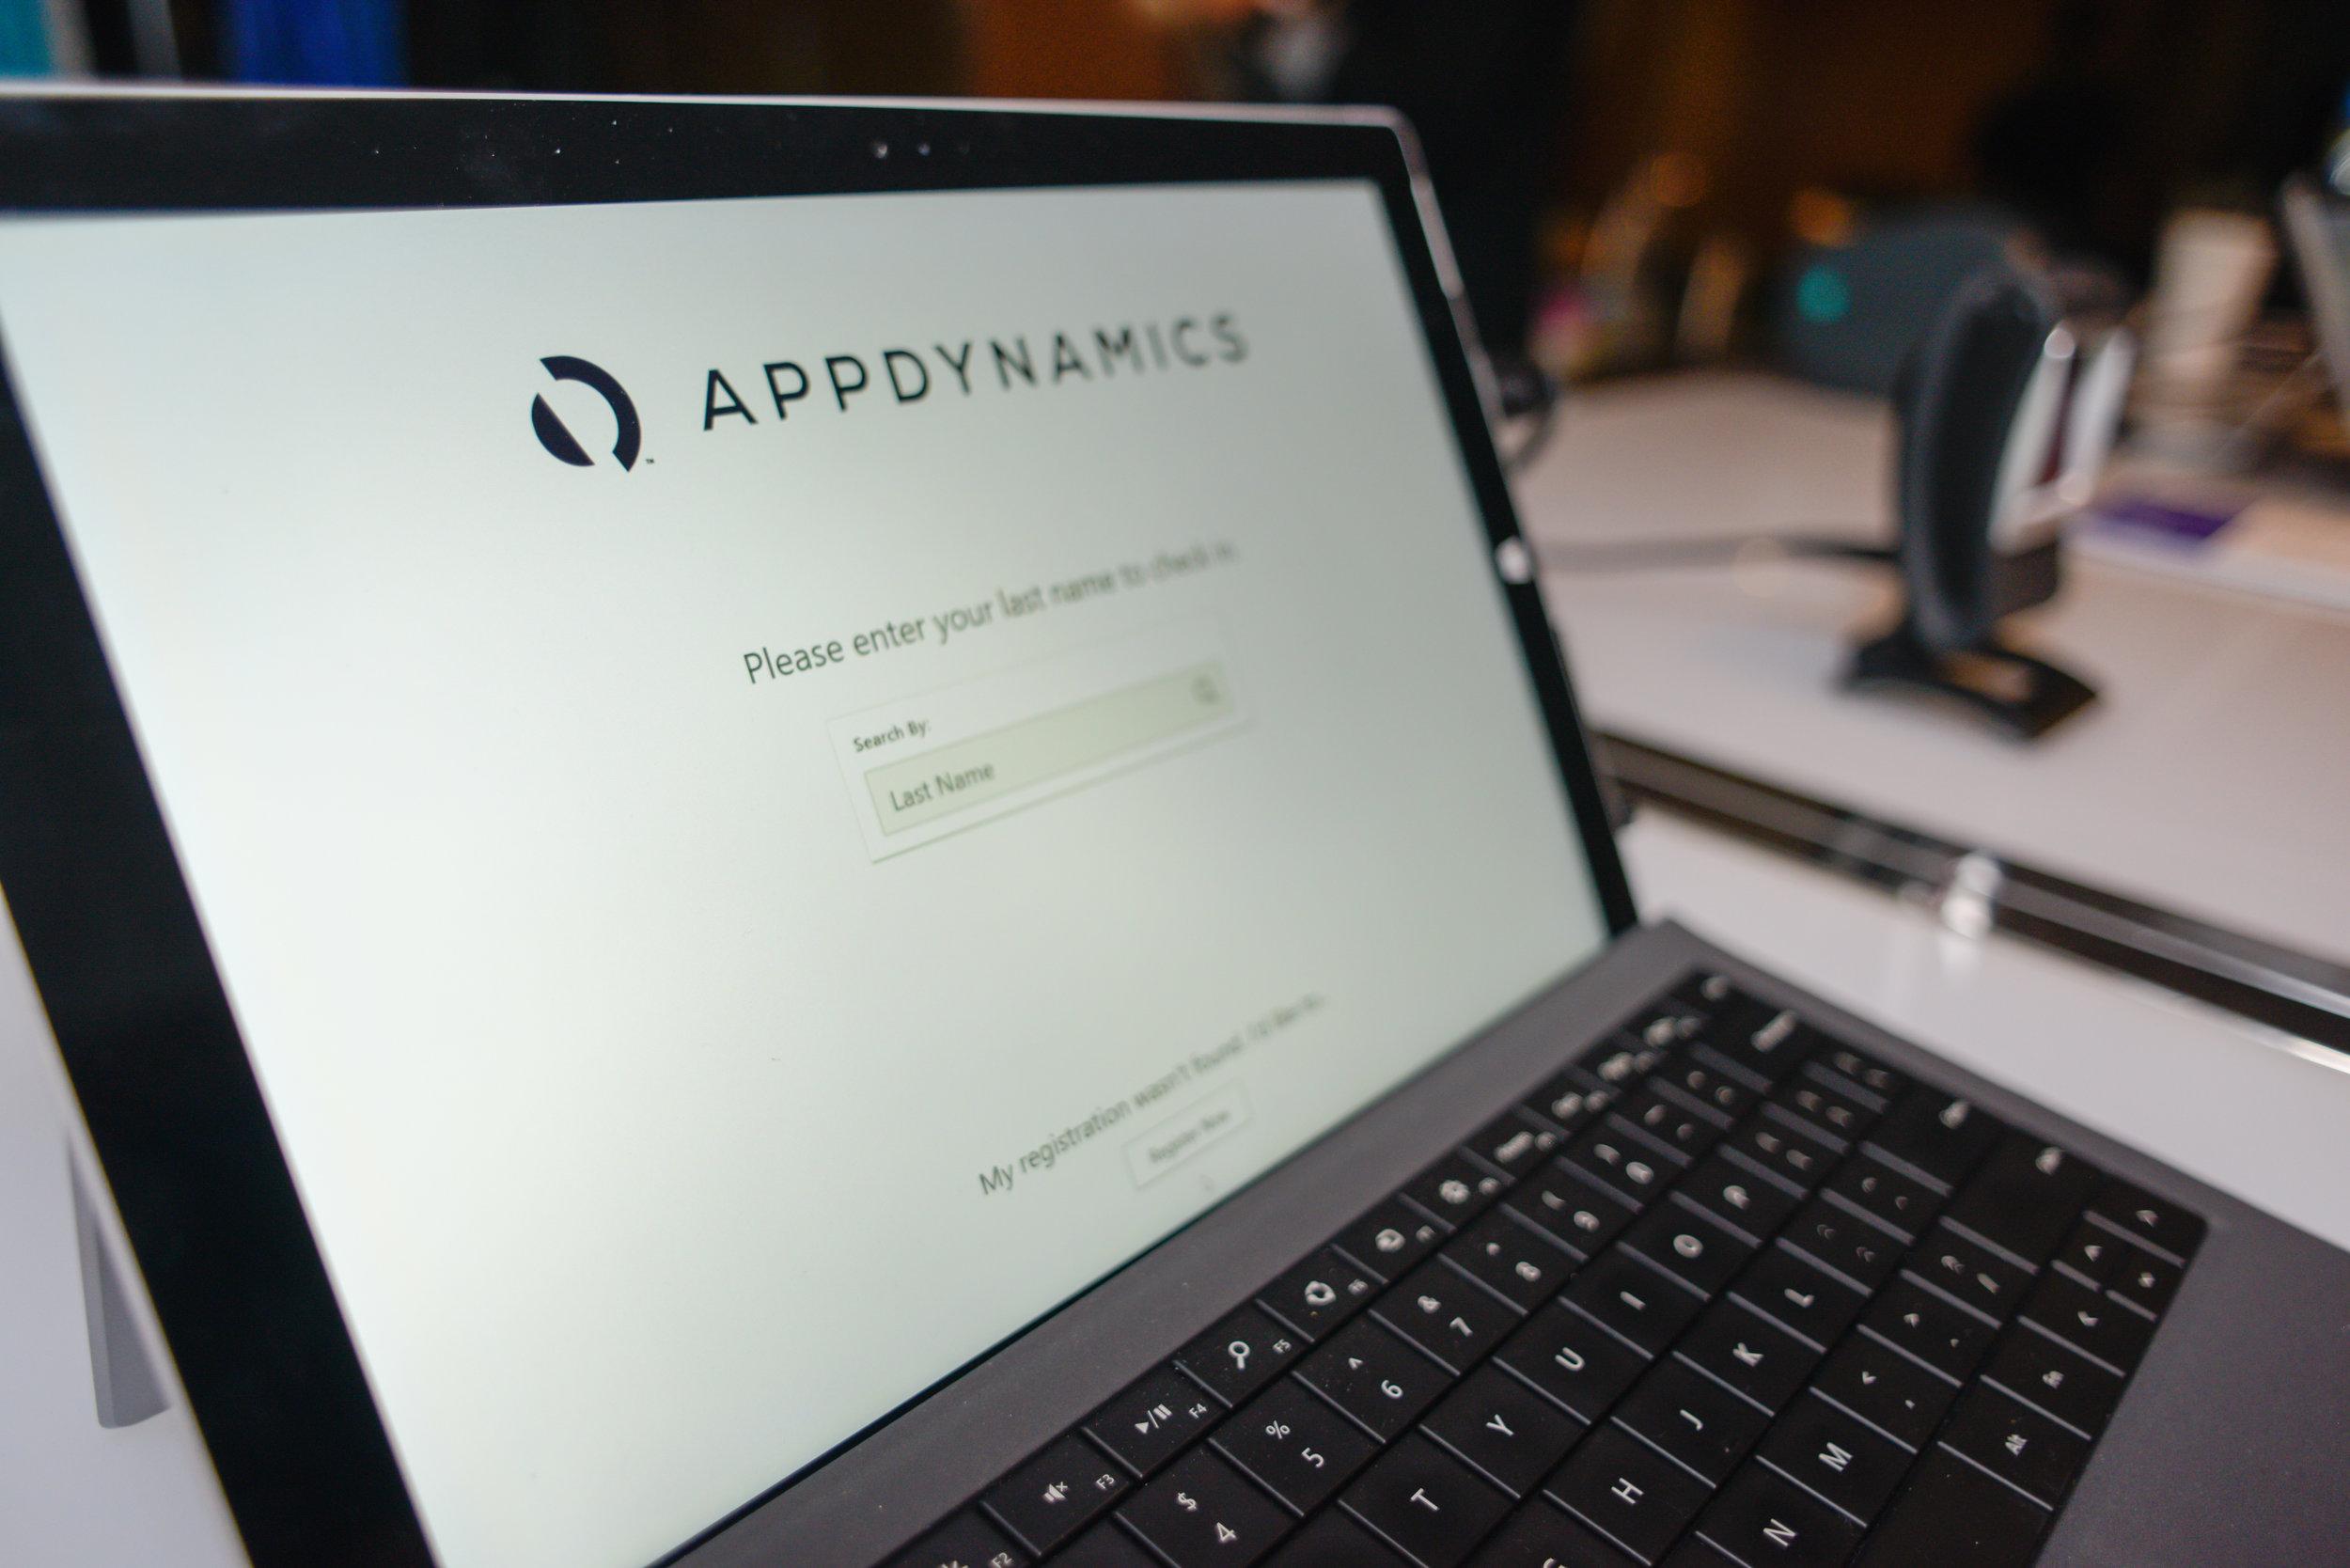 OHelloMedia-AppDynamics-GlobalTourDallas-TopSelect-81268.jpg